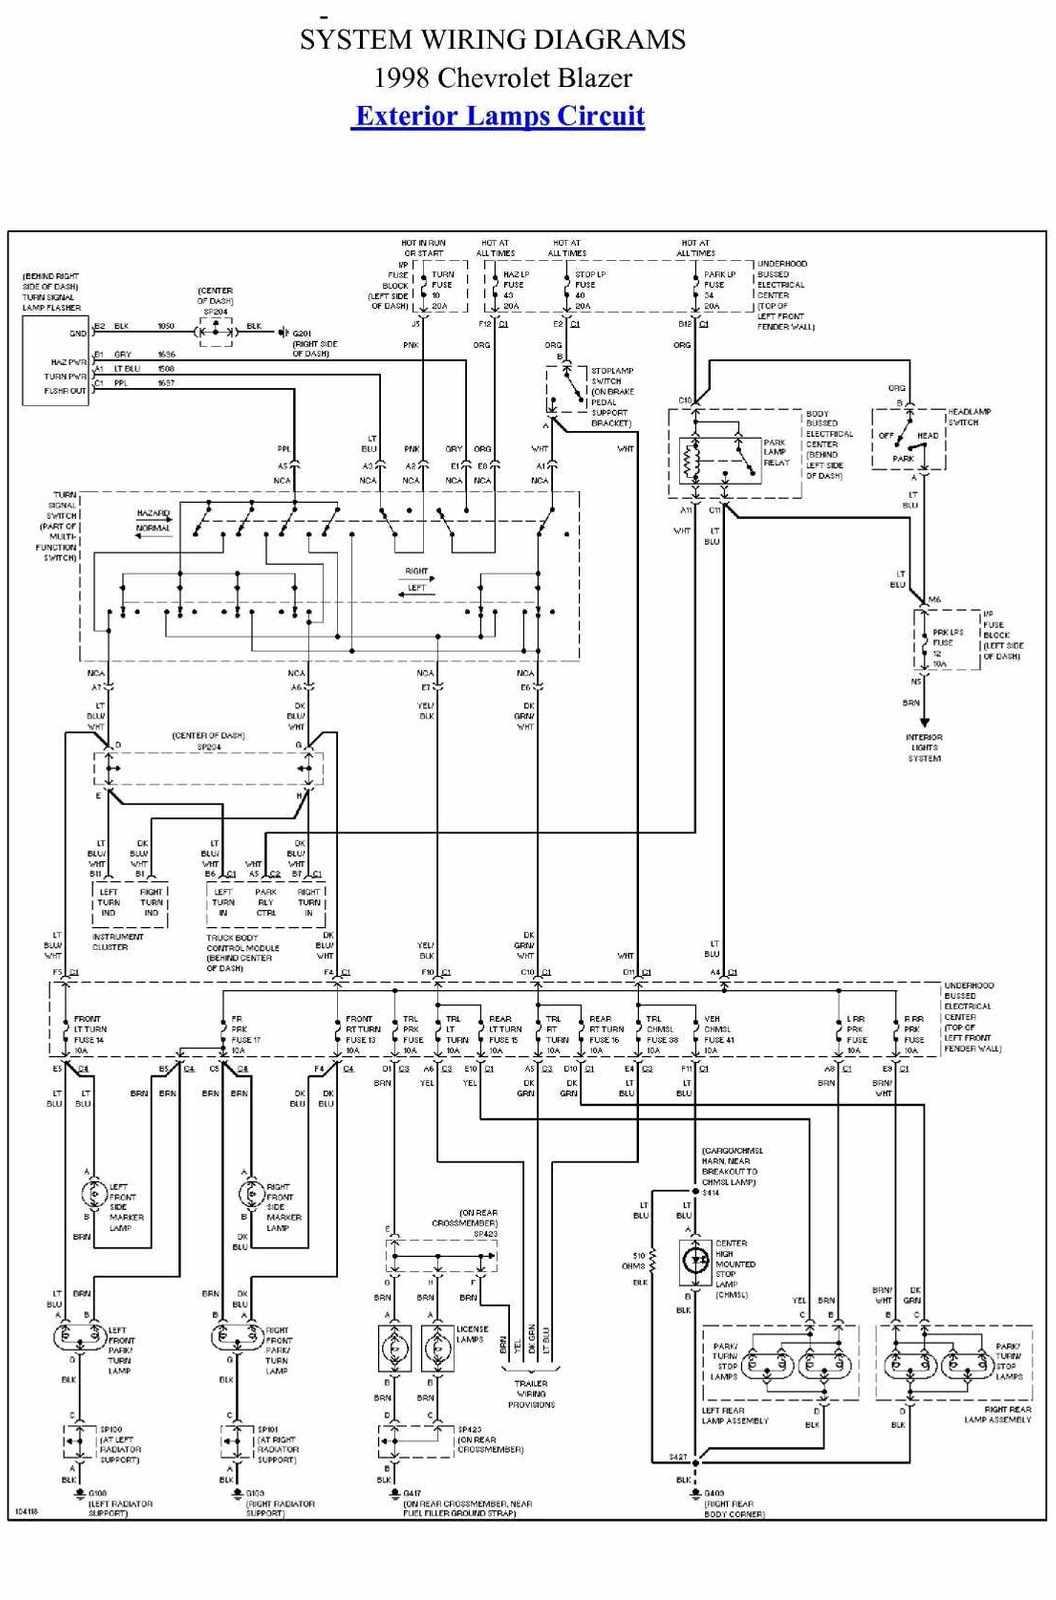 chevy blazer wiring diagram stereo fender diagrams 98 fuse box best library 94 s10 auto electrical rh mit edu uk bitoku me